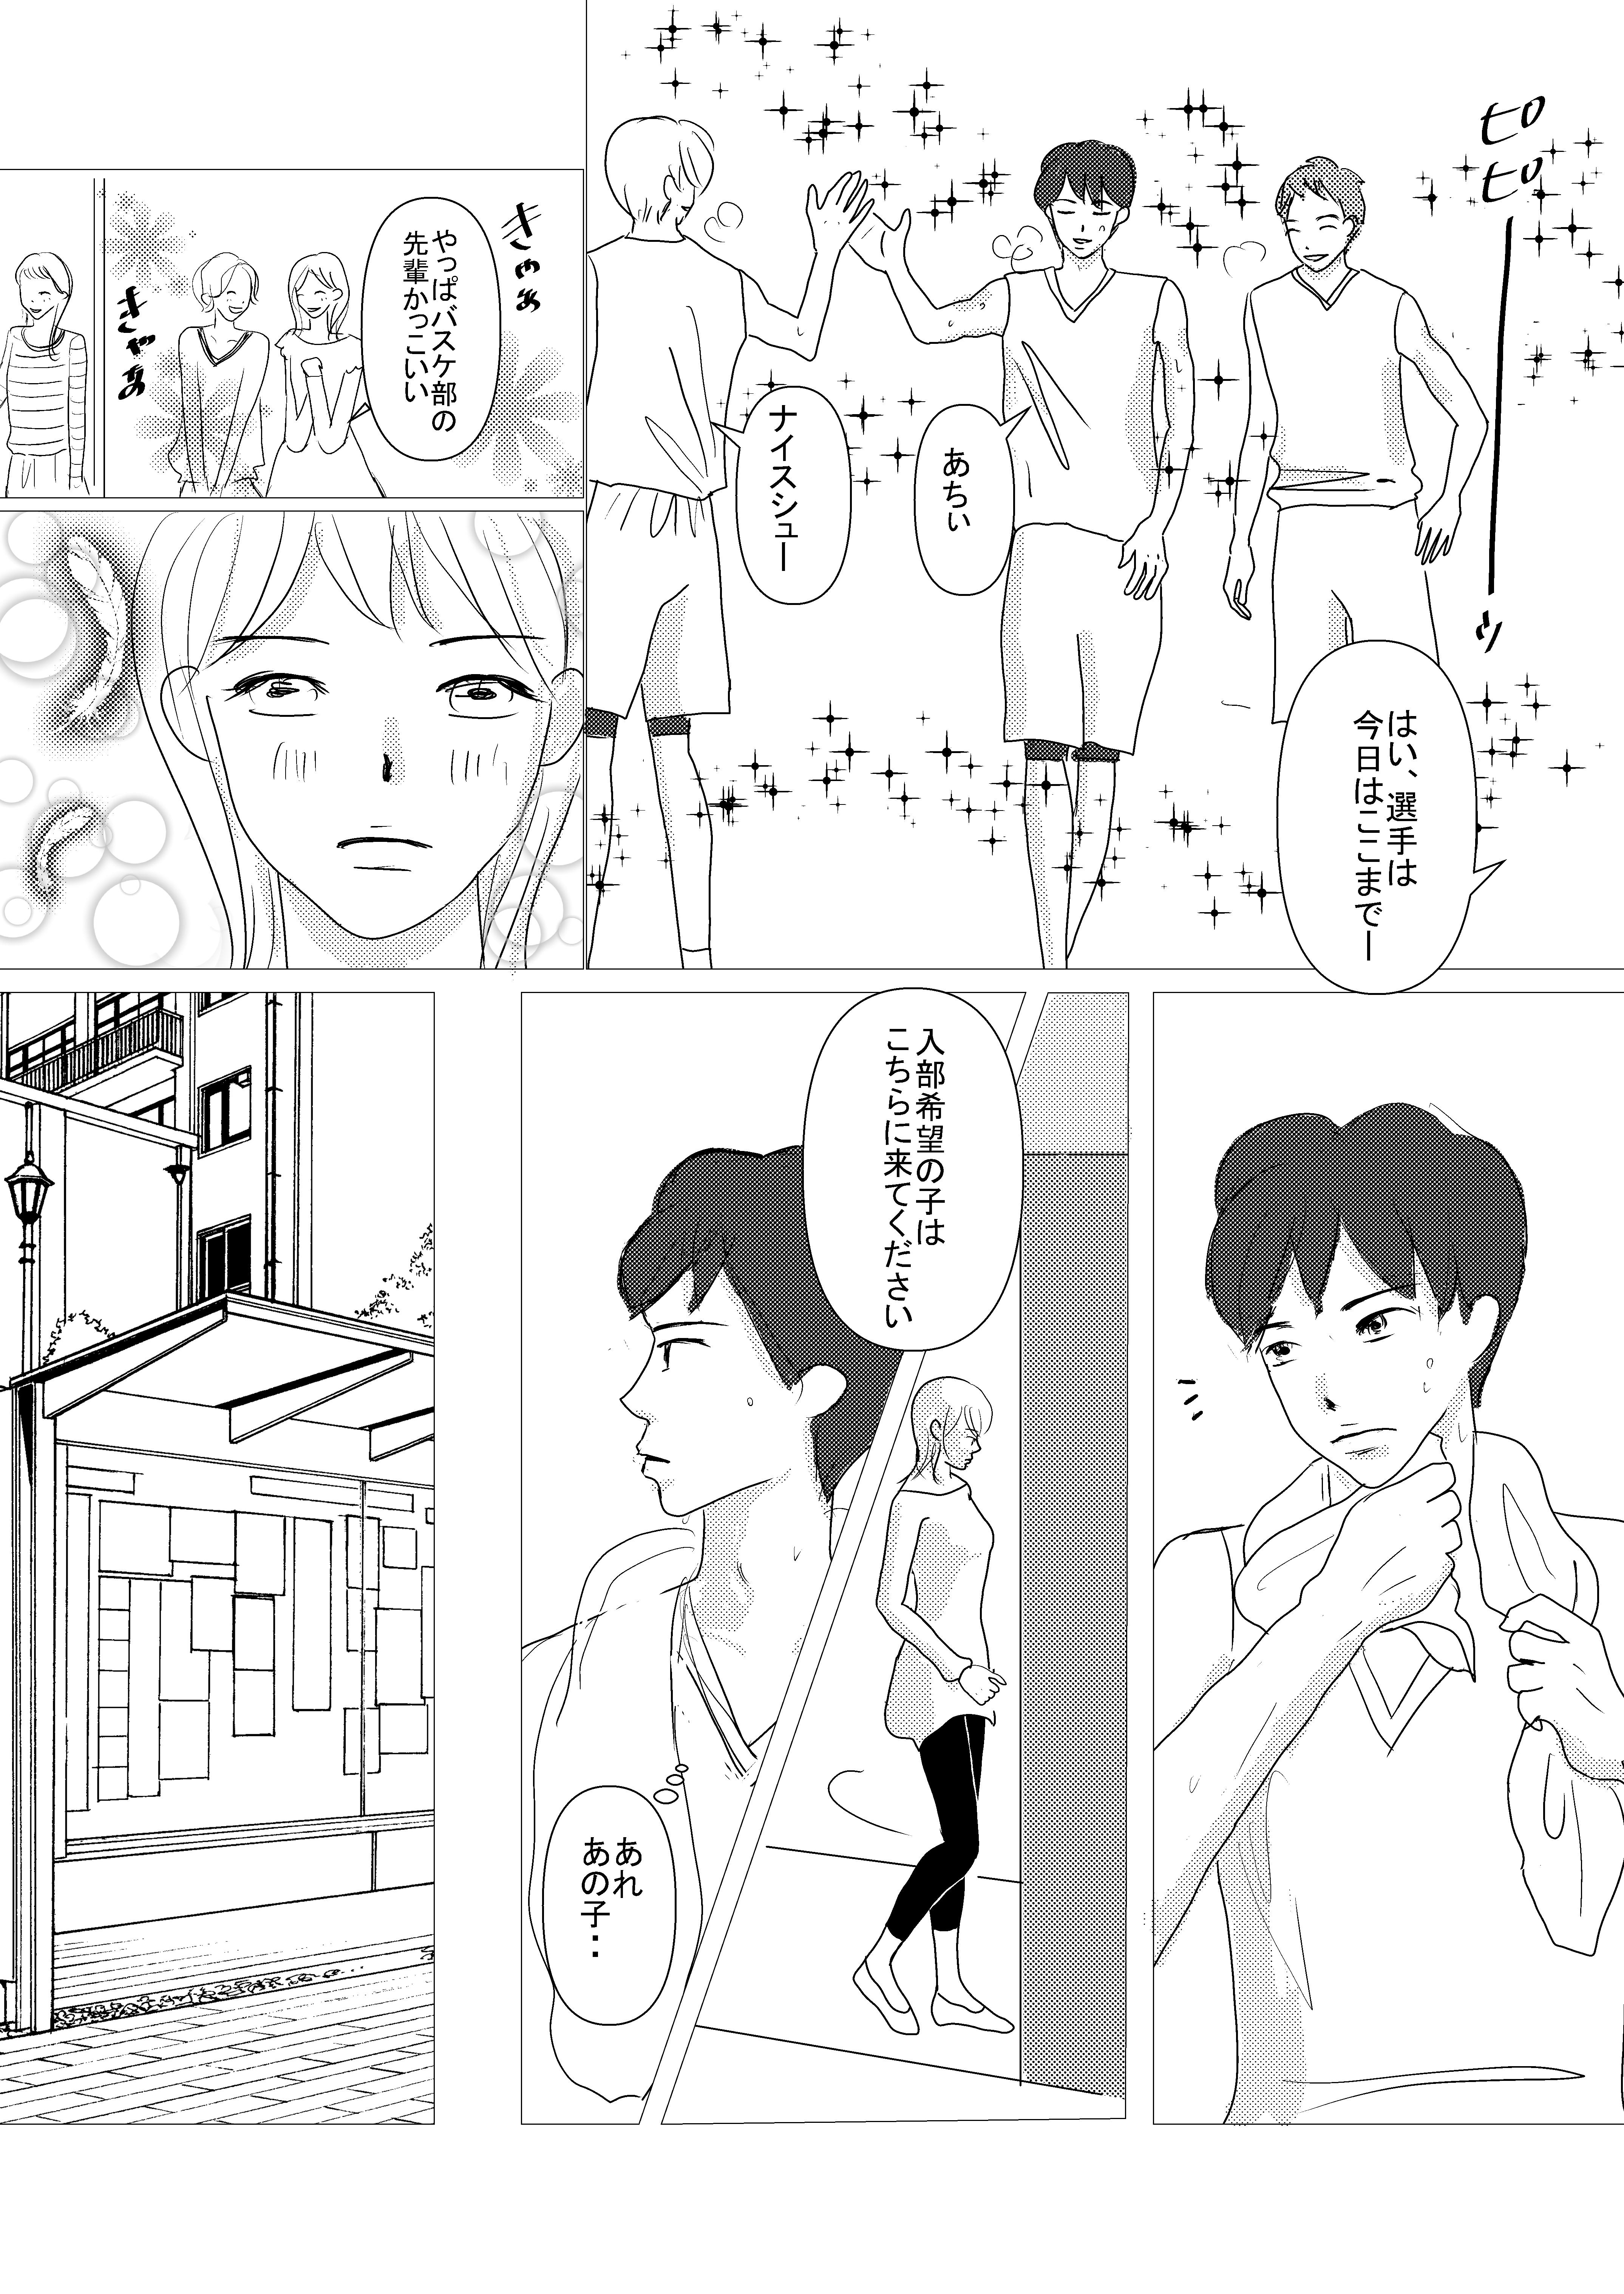 恋愛漫画/大学生/社会人/shoujyo manga/米加夢/19ページ